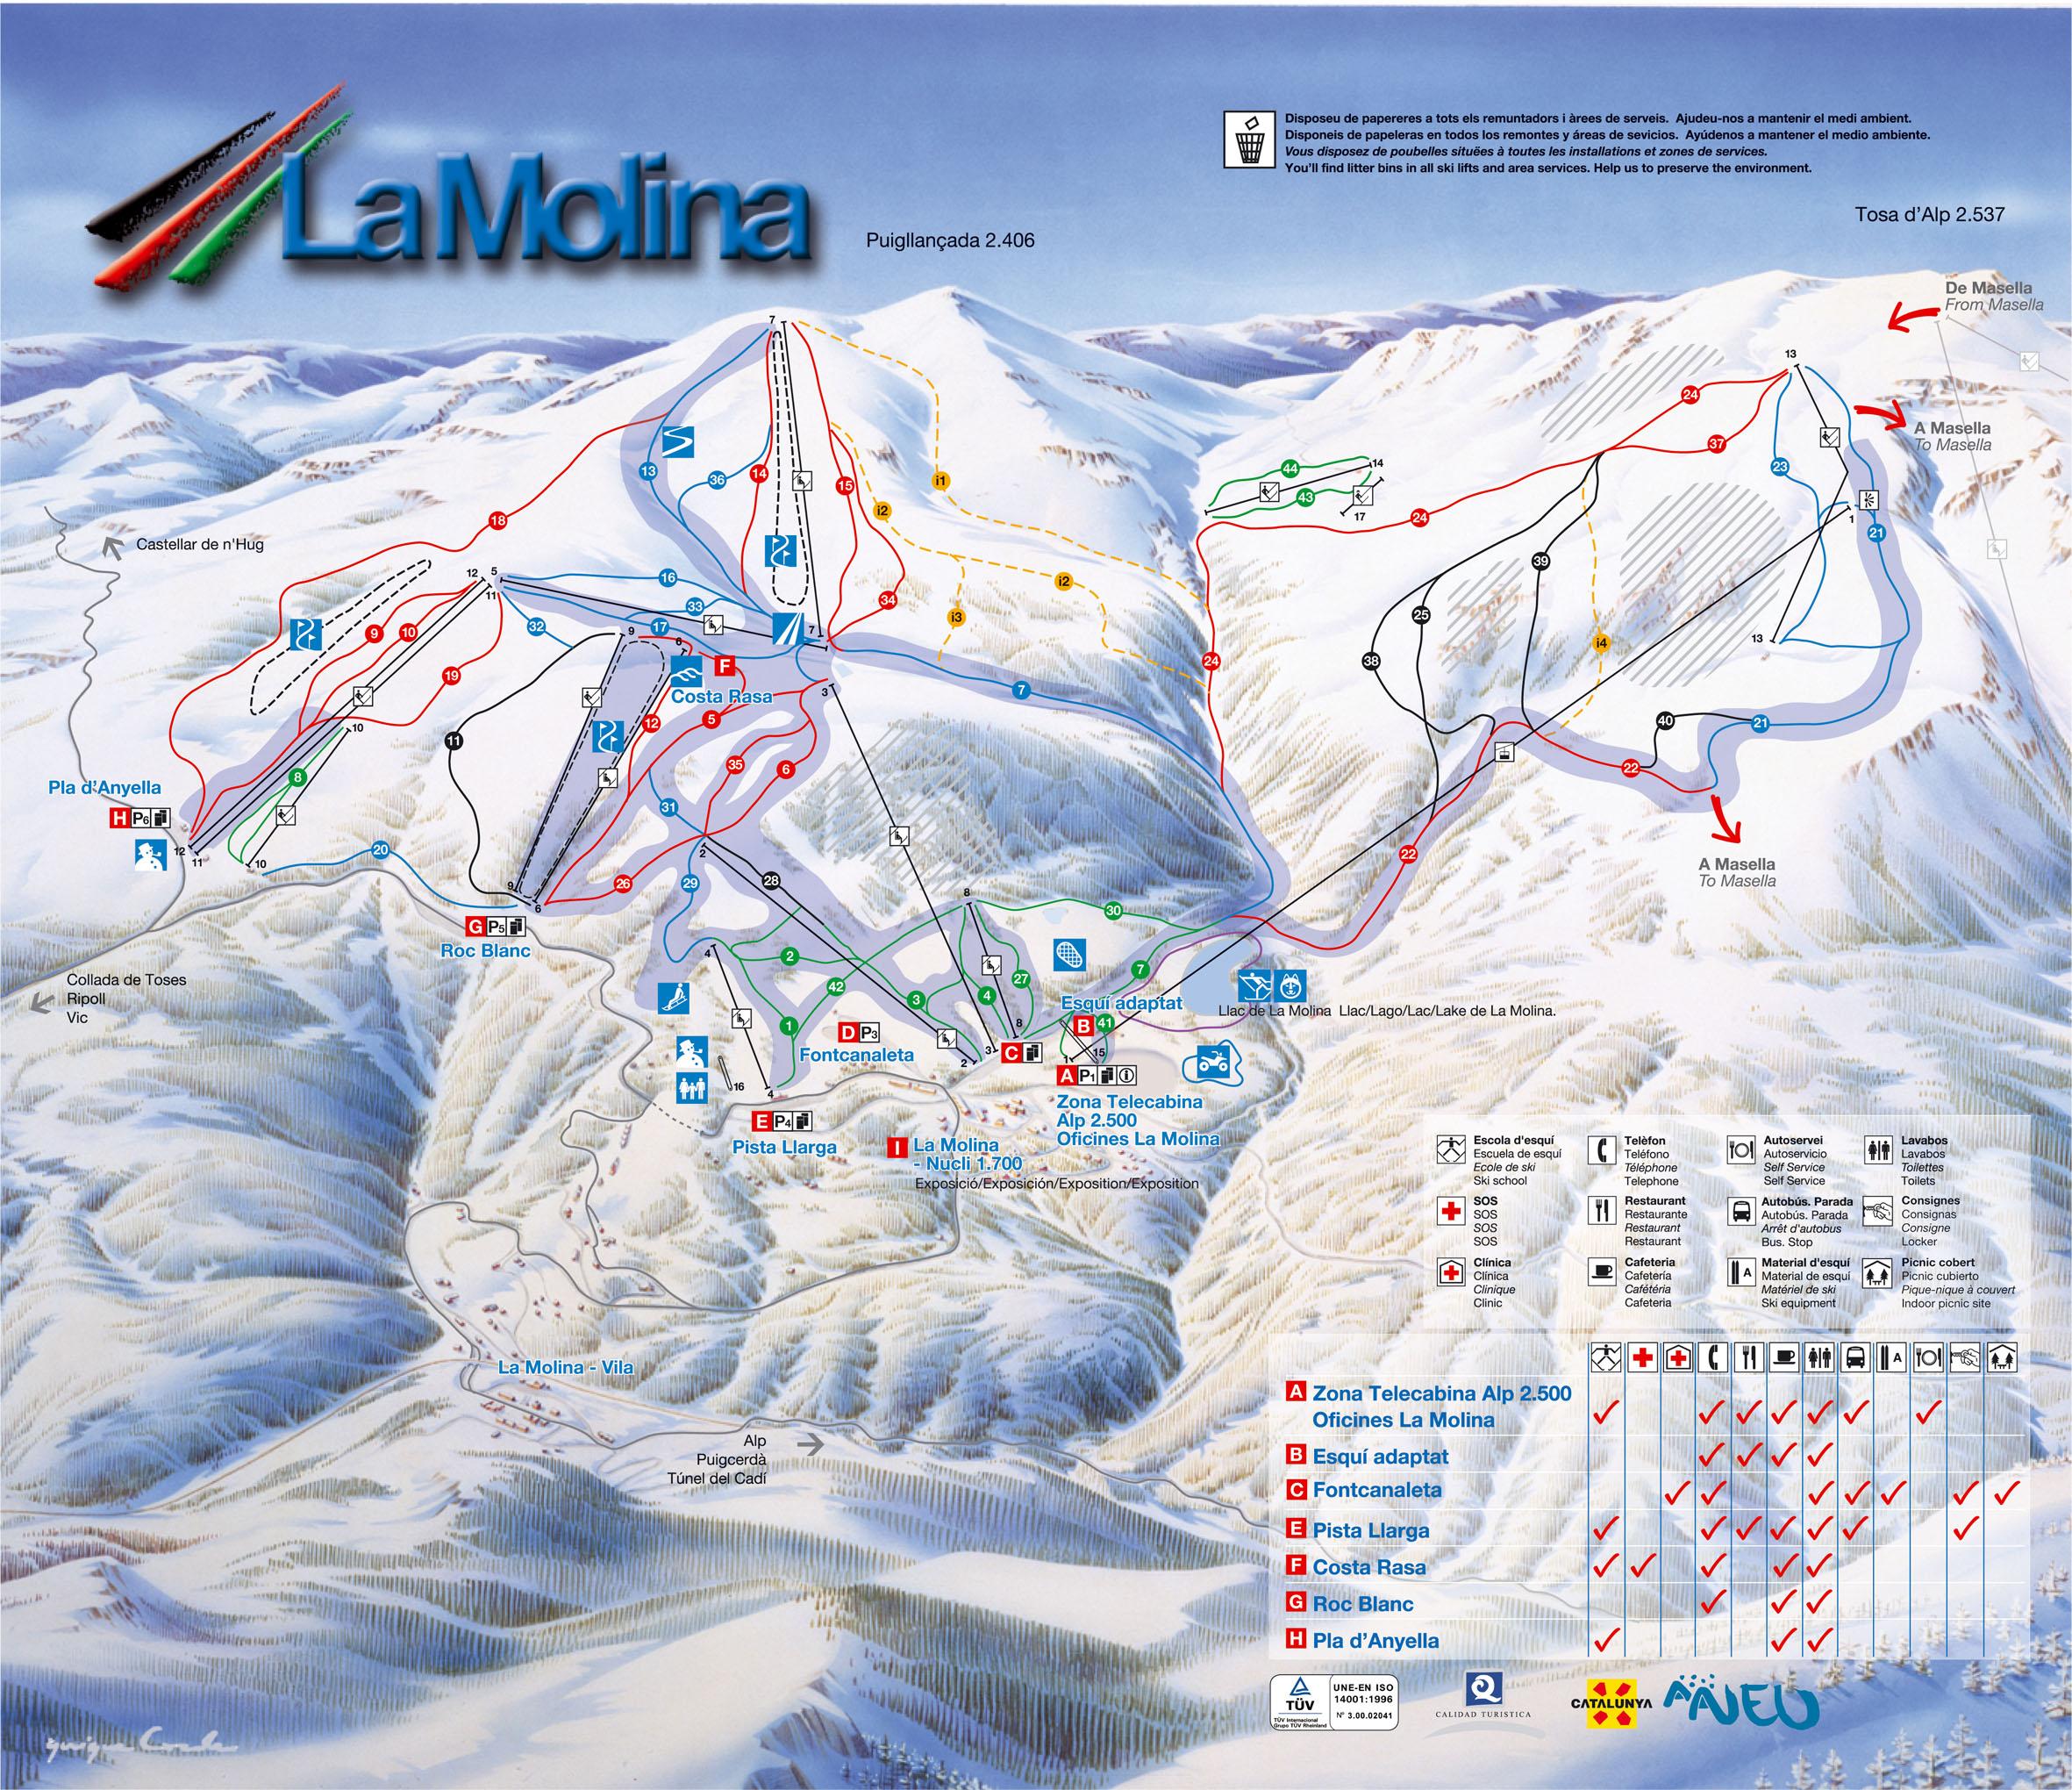 Alp 2500 La Molina Masella Ski Trail Map Carretera D039alp Masella 17538 Alp Spain Mappery